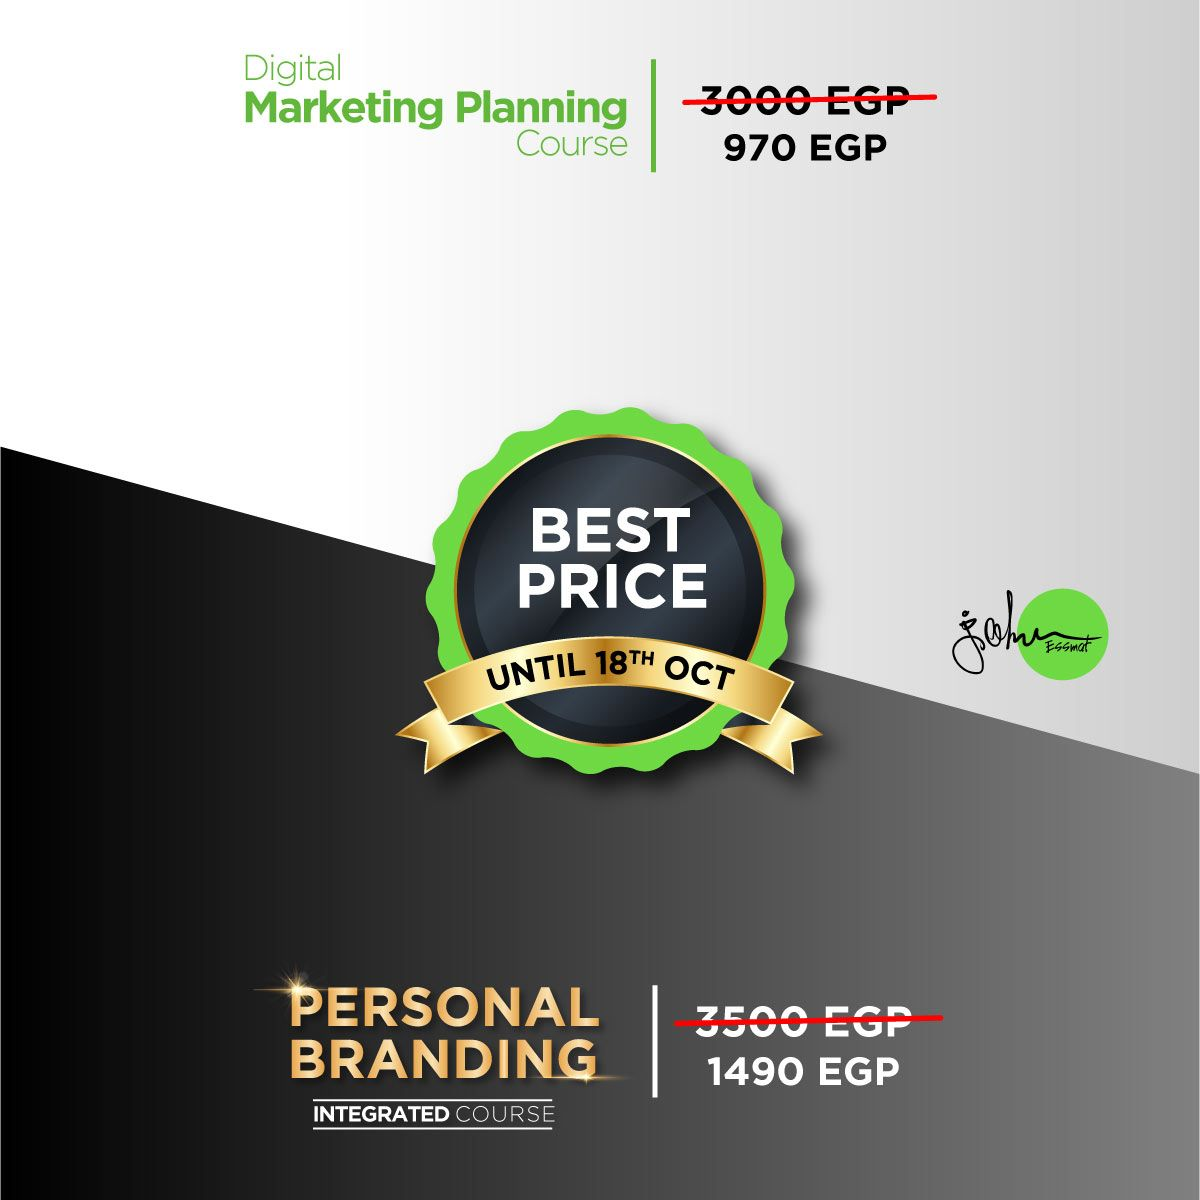 Best Price Digital Marketing Marketing Plan Tech Company Logos